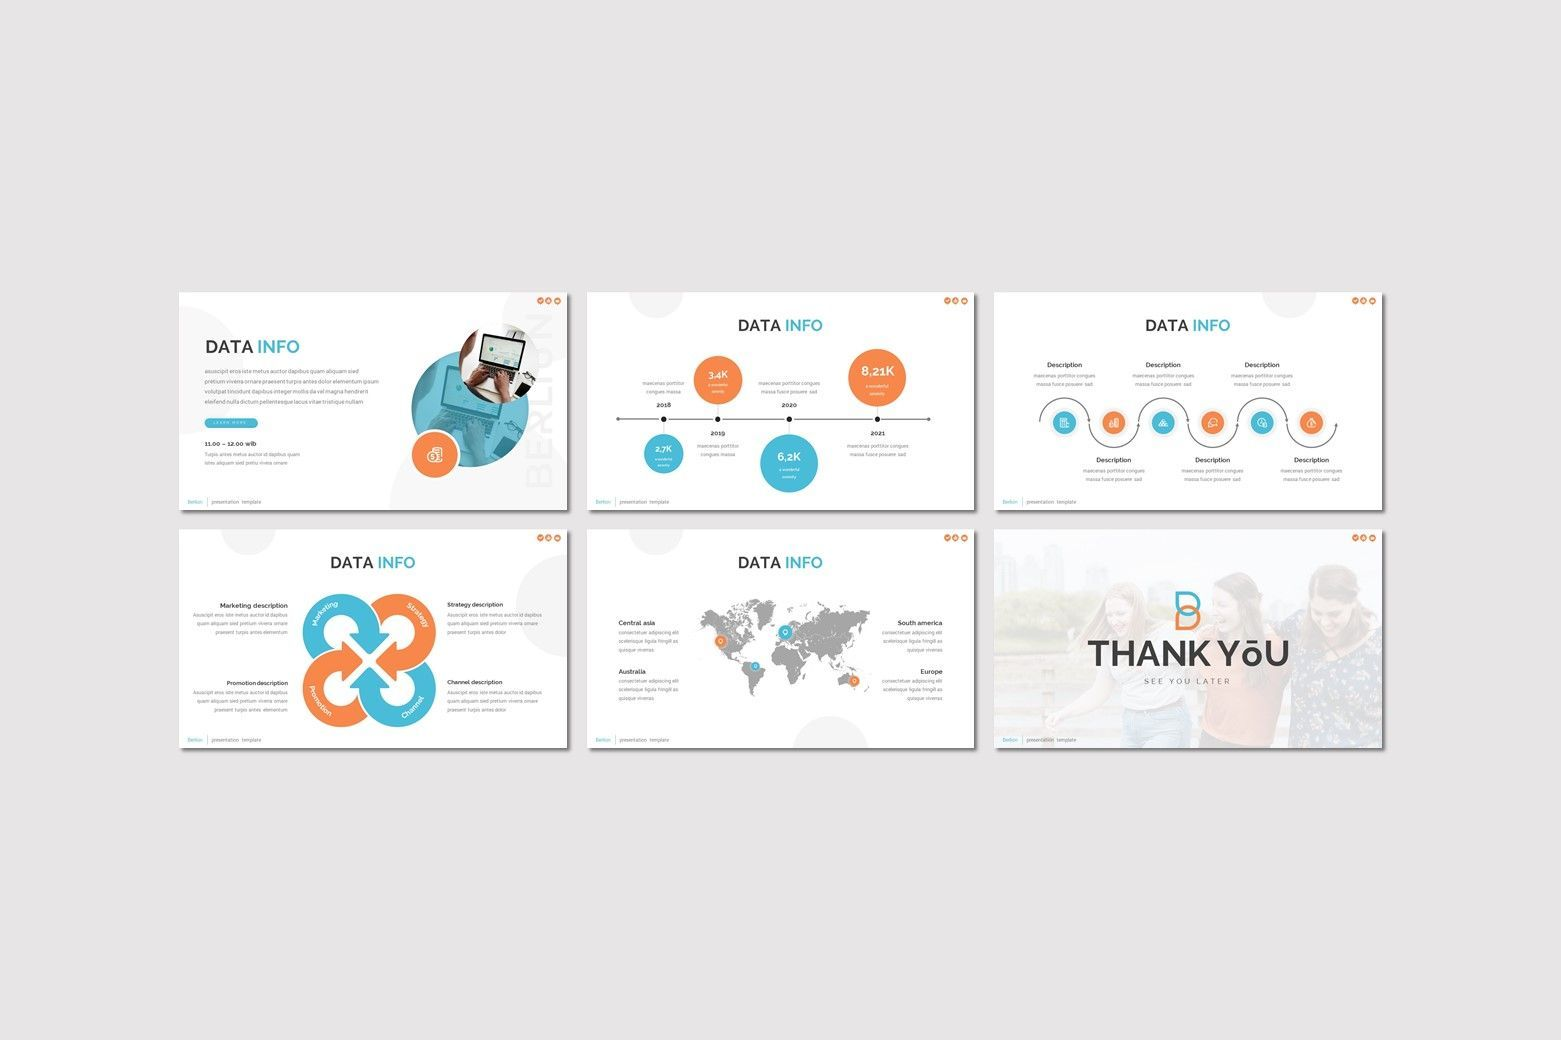 Berlion - Google Slides Template, Slide 4, 08041, Presentation Templates — PoweredTemplate.com